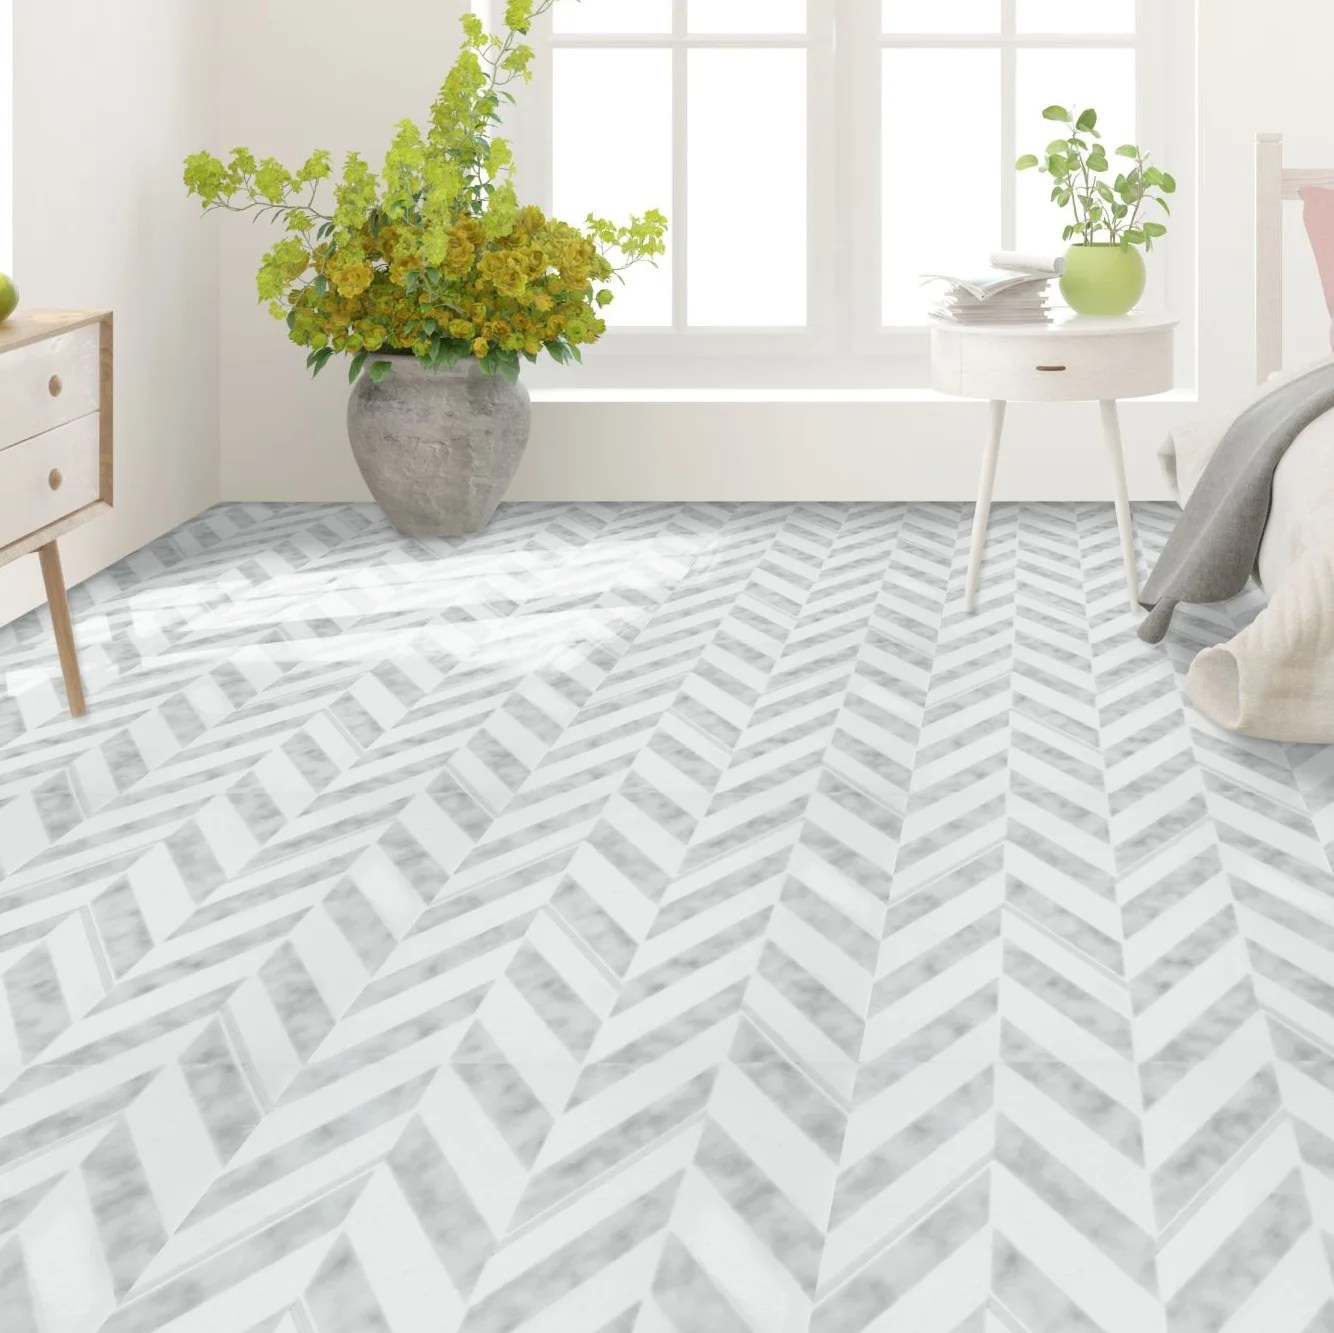 achim importing co retro 12x12 self adhesive vinyl floor tile chevron 20 tiles 20 sq ft reviews wayfair ca